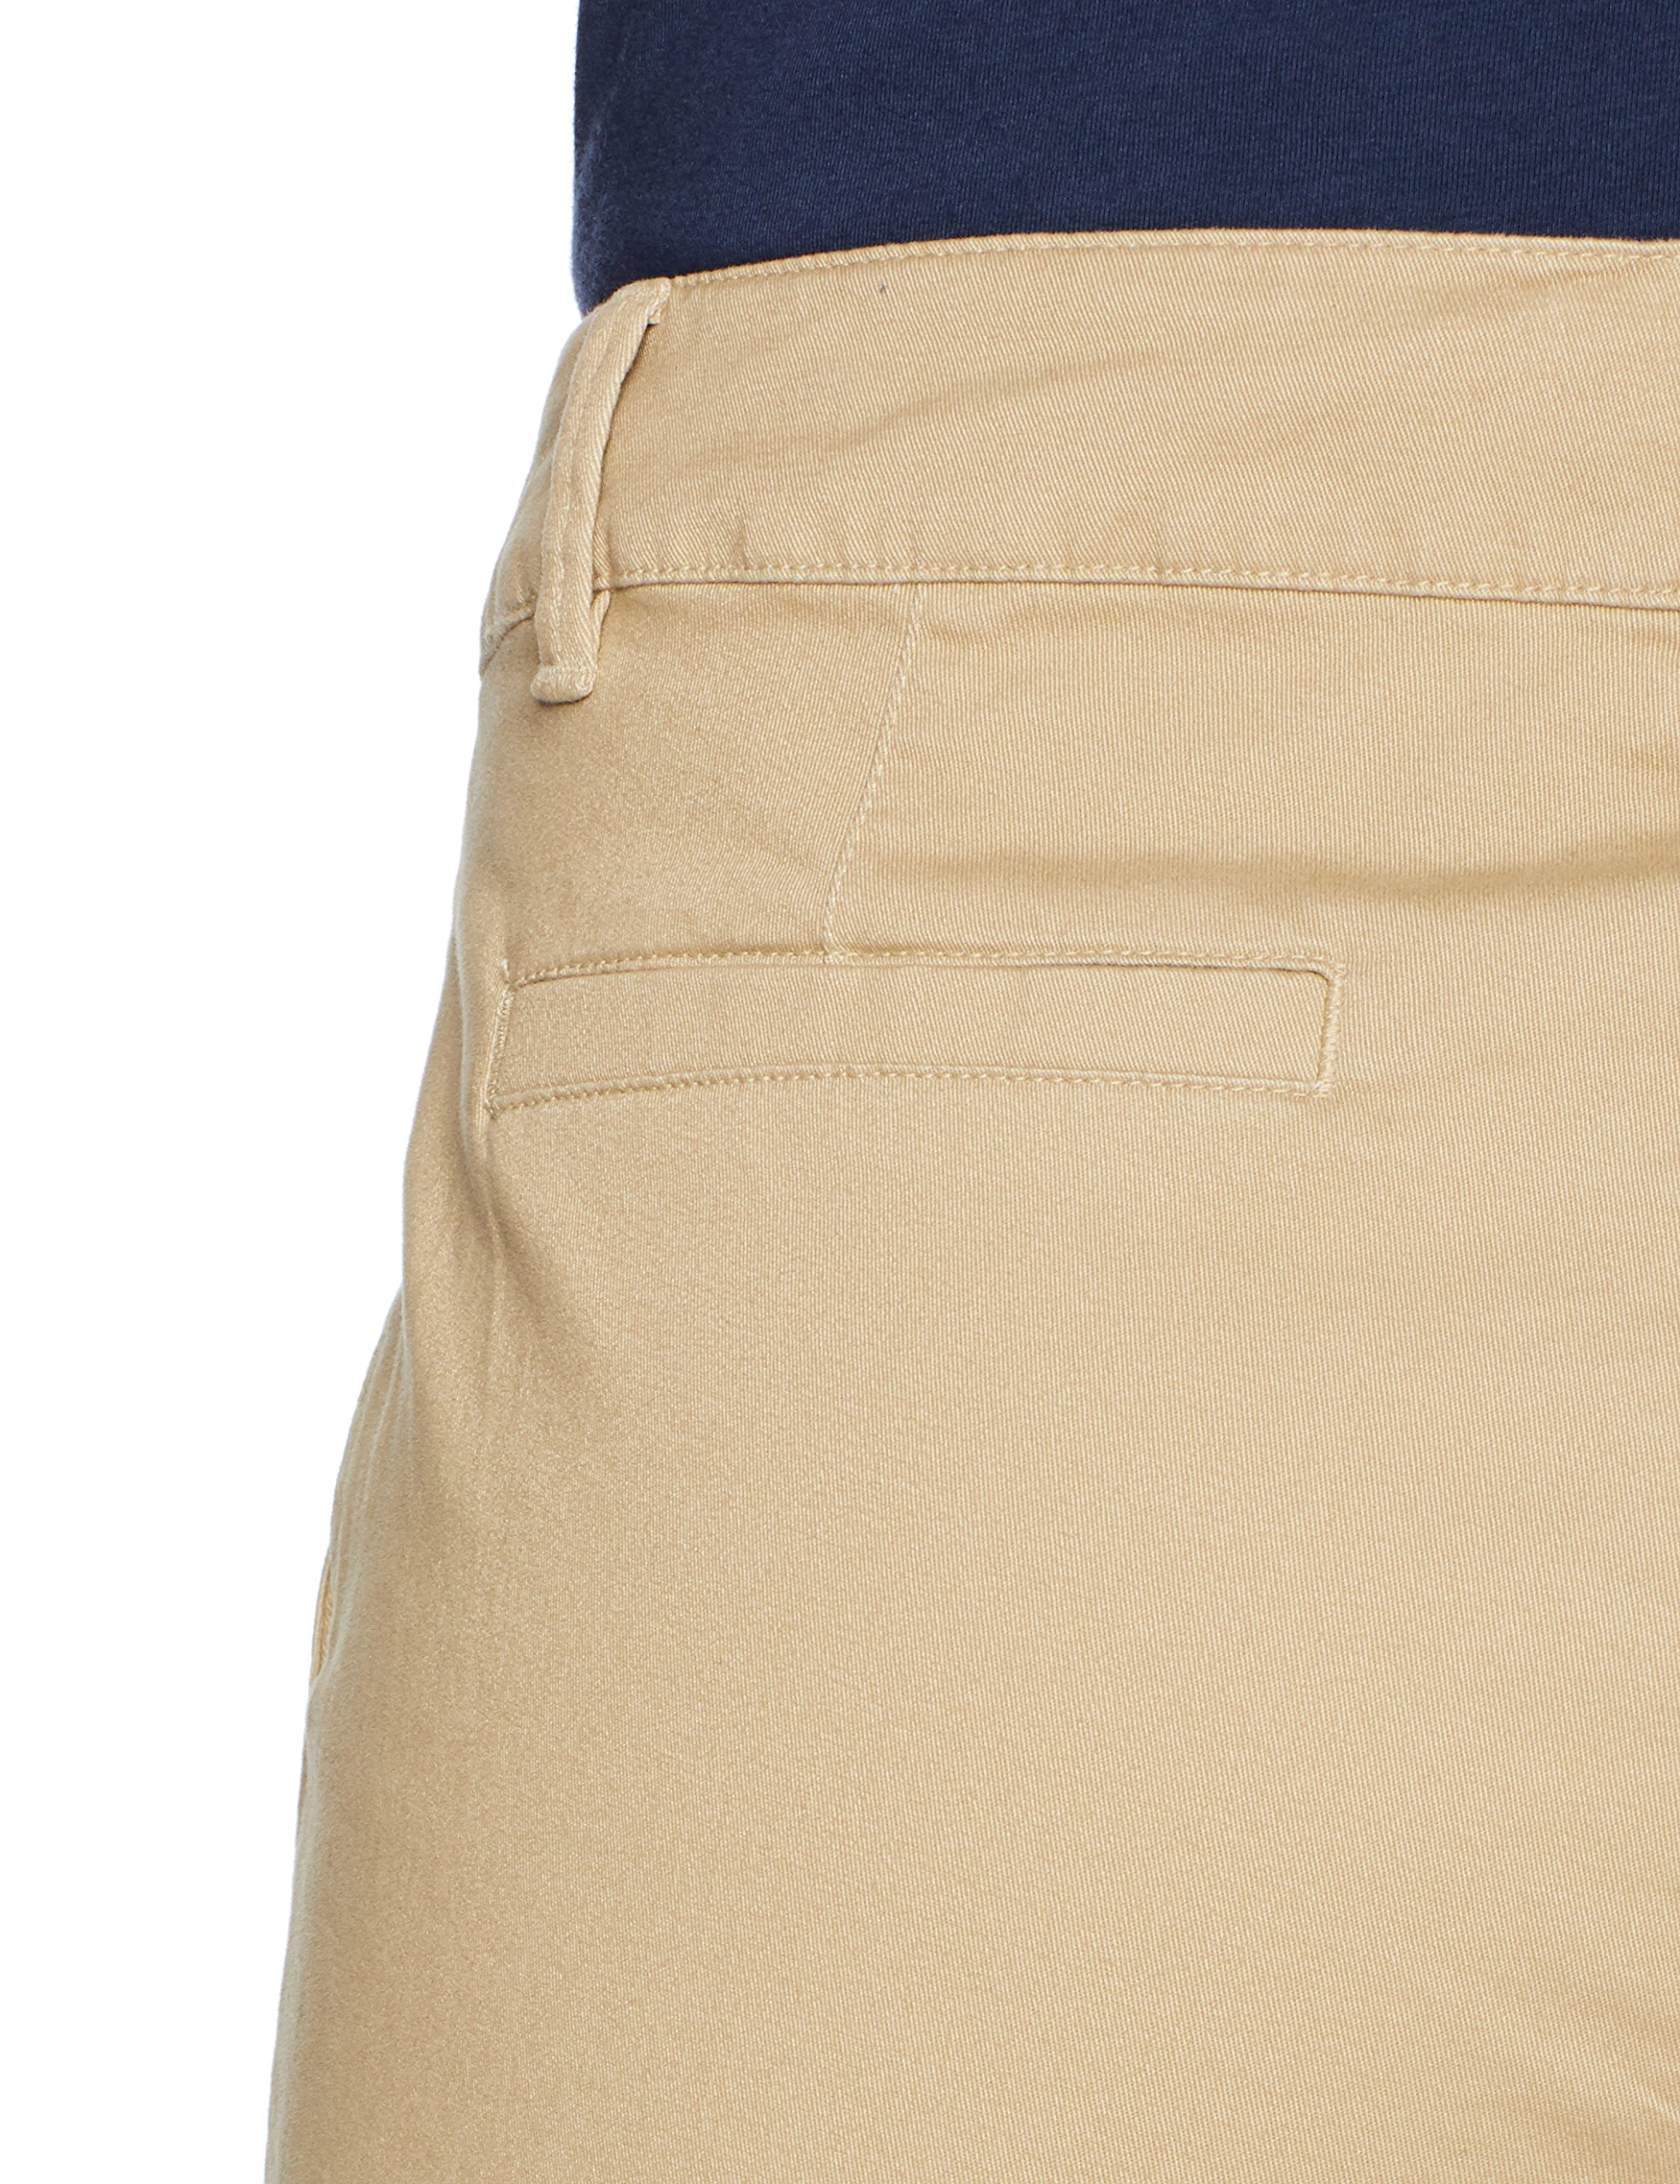 Amazon Essentials Women's 5'' Inseam Solid Chino Short Shorts, Khaki, 12 by Amazon Essentials (Image #5)